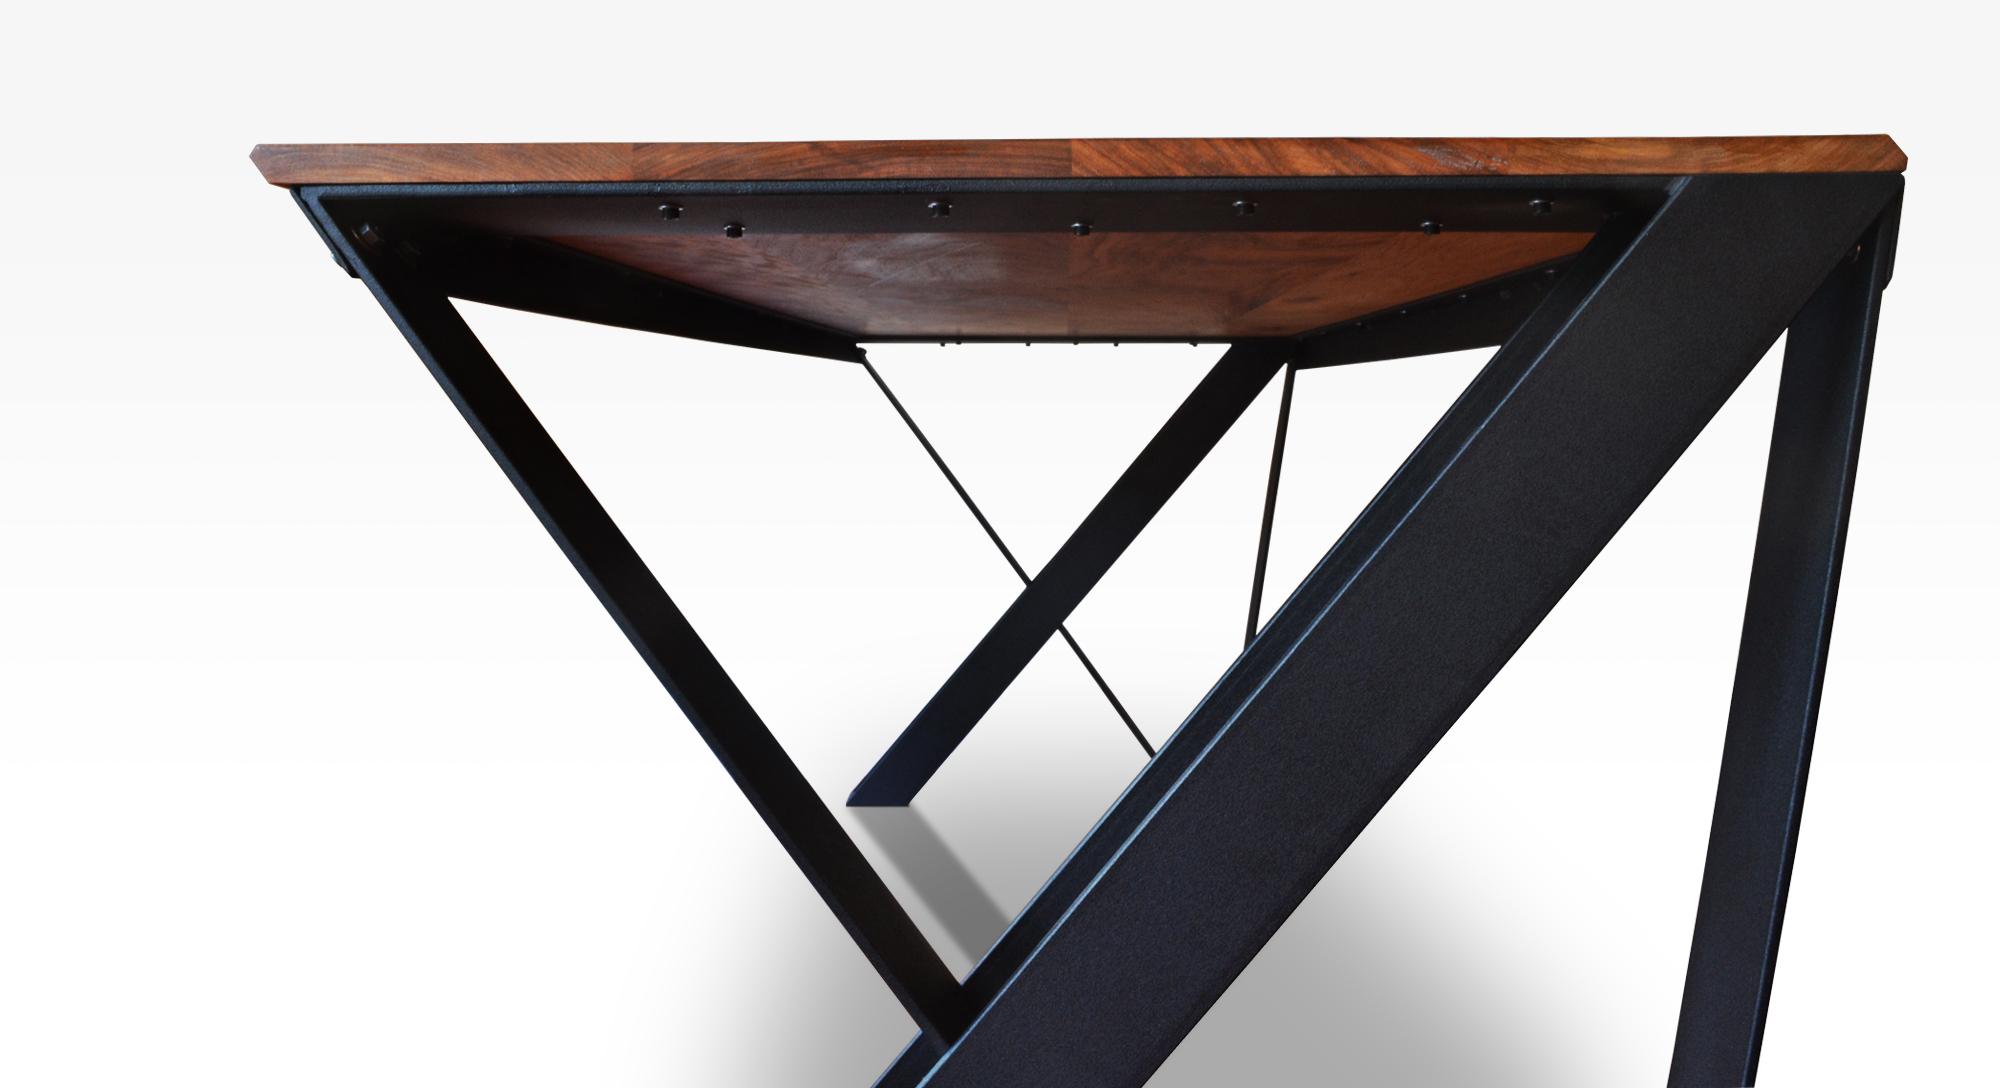 VX desk (tizzio) 2018 by Cristian Arostegui from Arostegui Studio